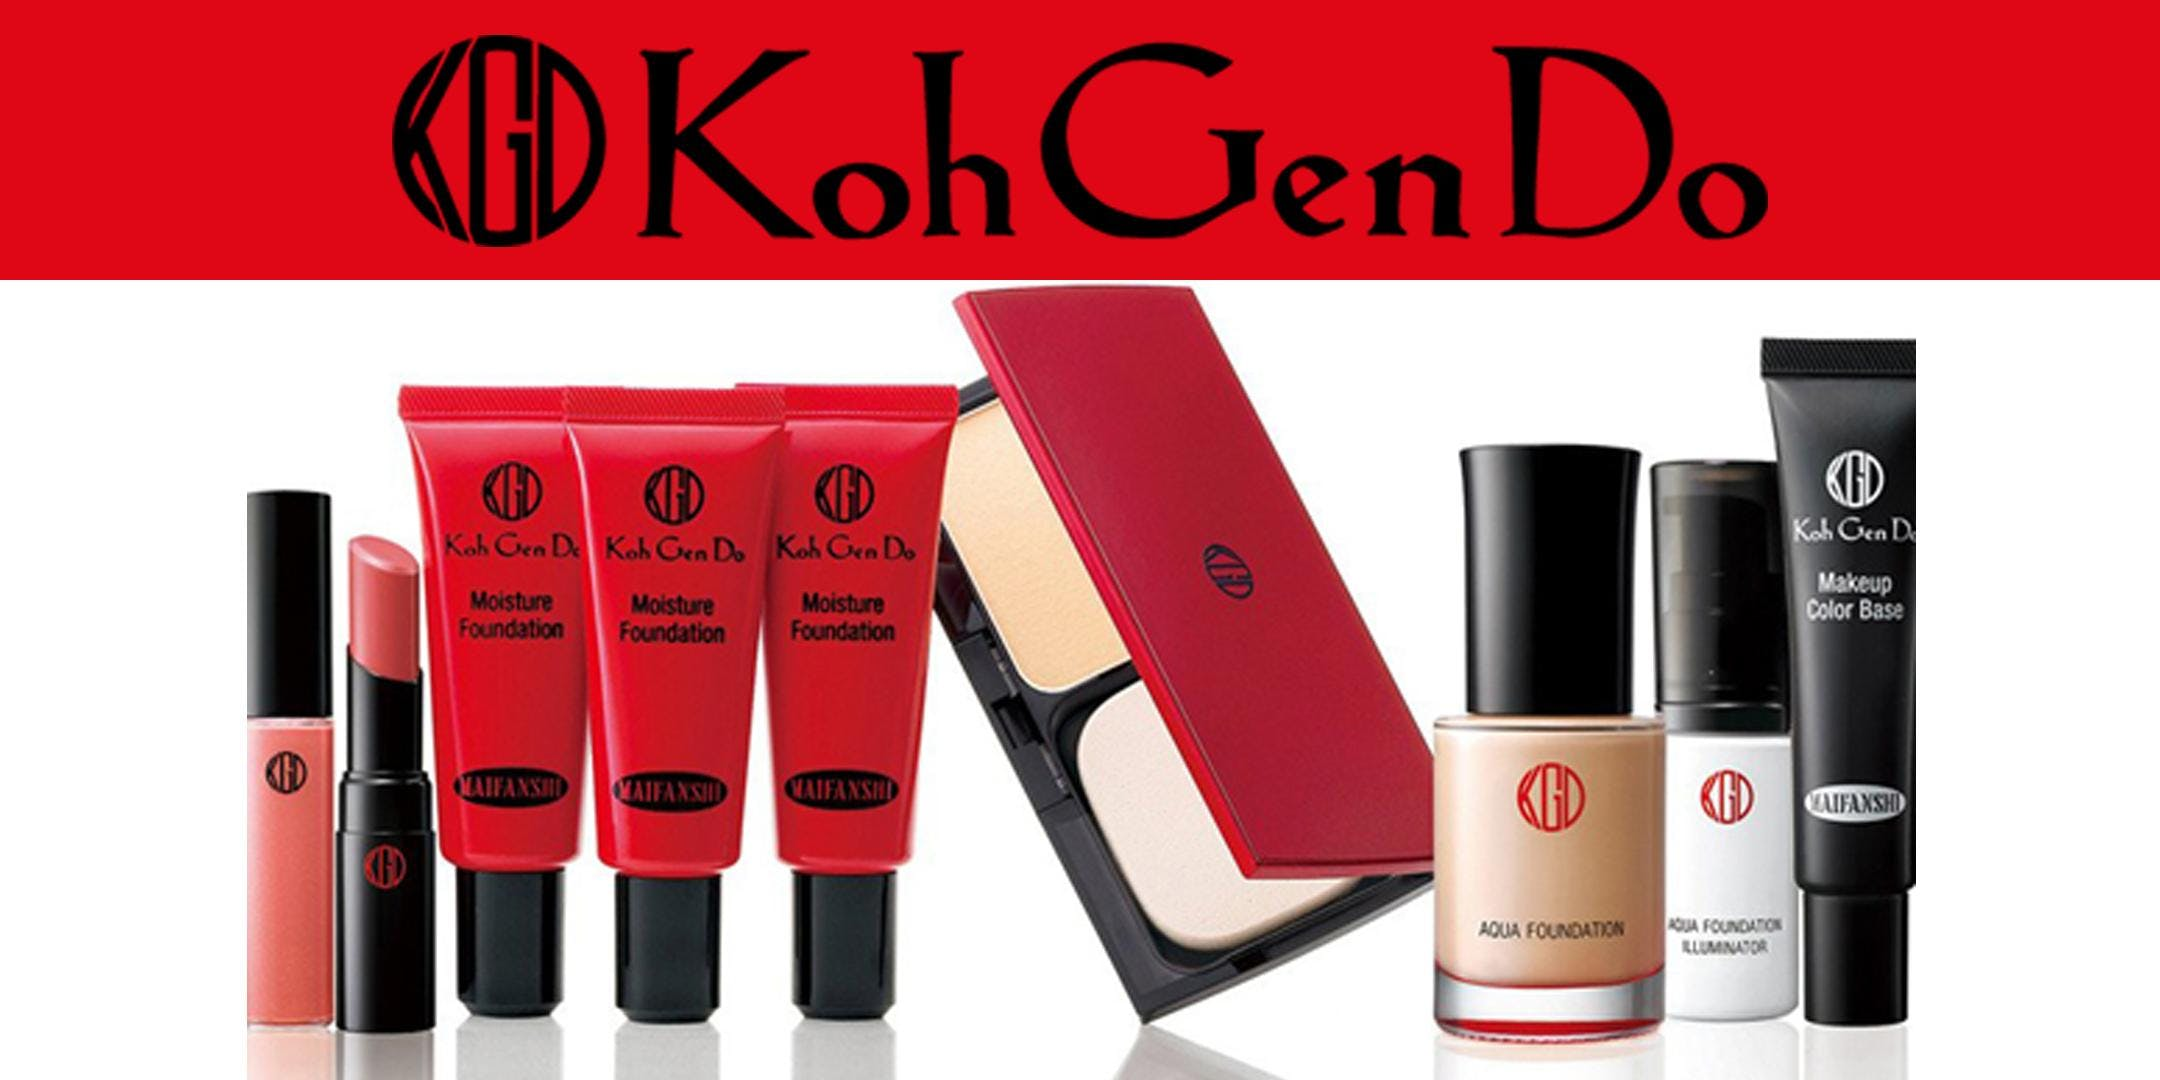 FREE Makeup seminar with Koh Gen Do brand experts Diane Nakauchi and Henry Puebla